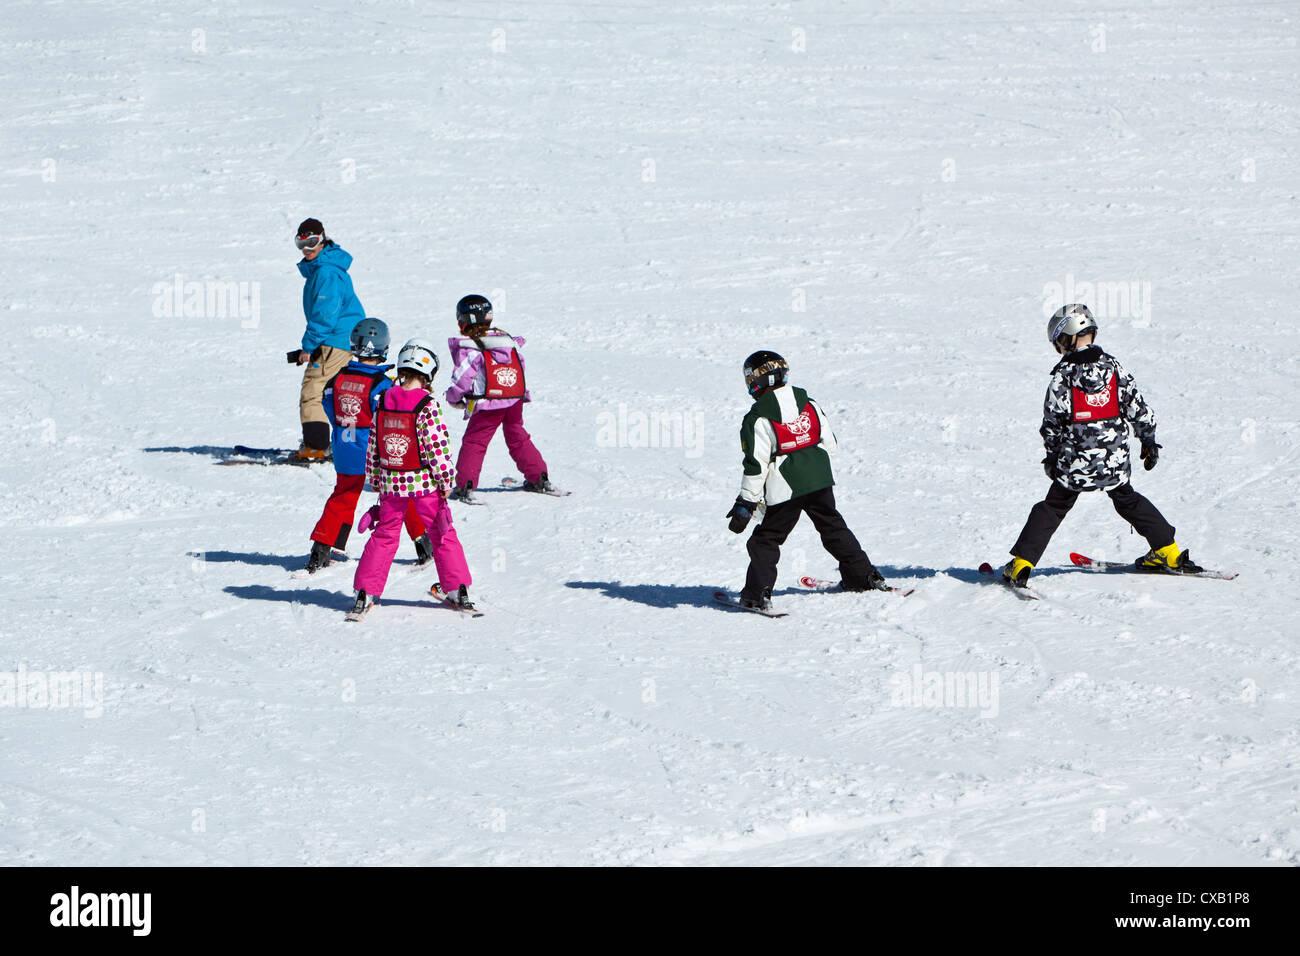 Whistler Blackcomb Ski Resort, Whistler, British Columbia, Canada, North America - Stock Image